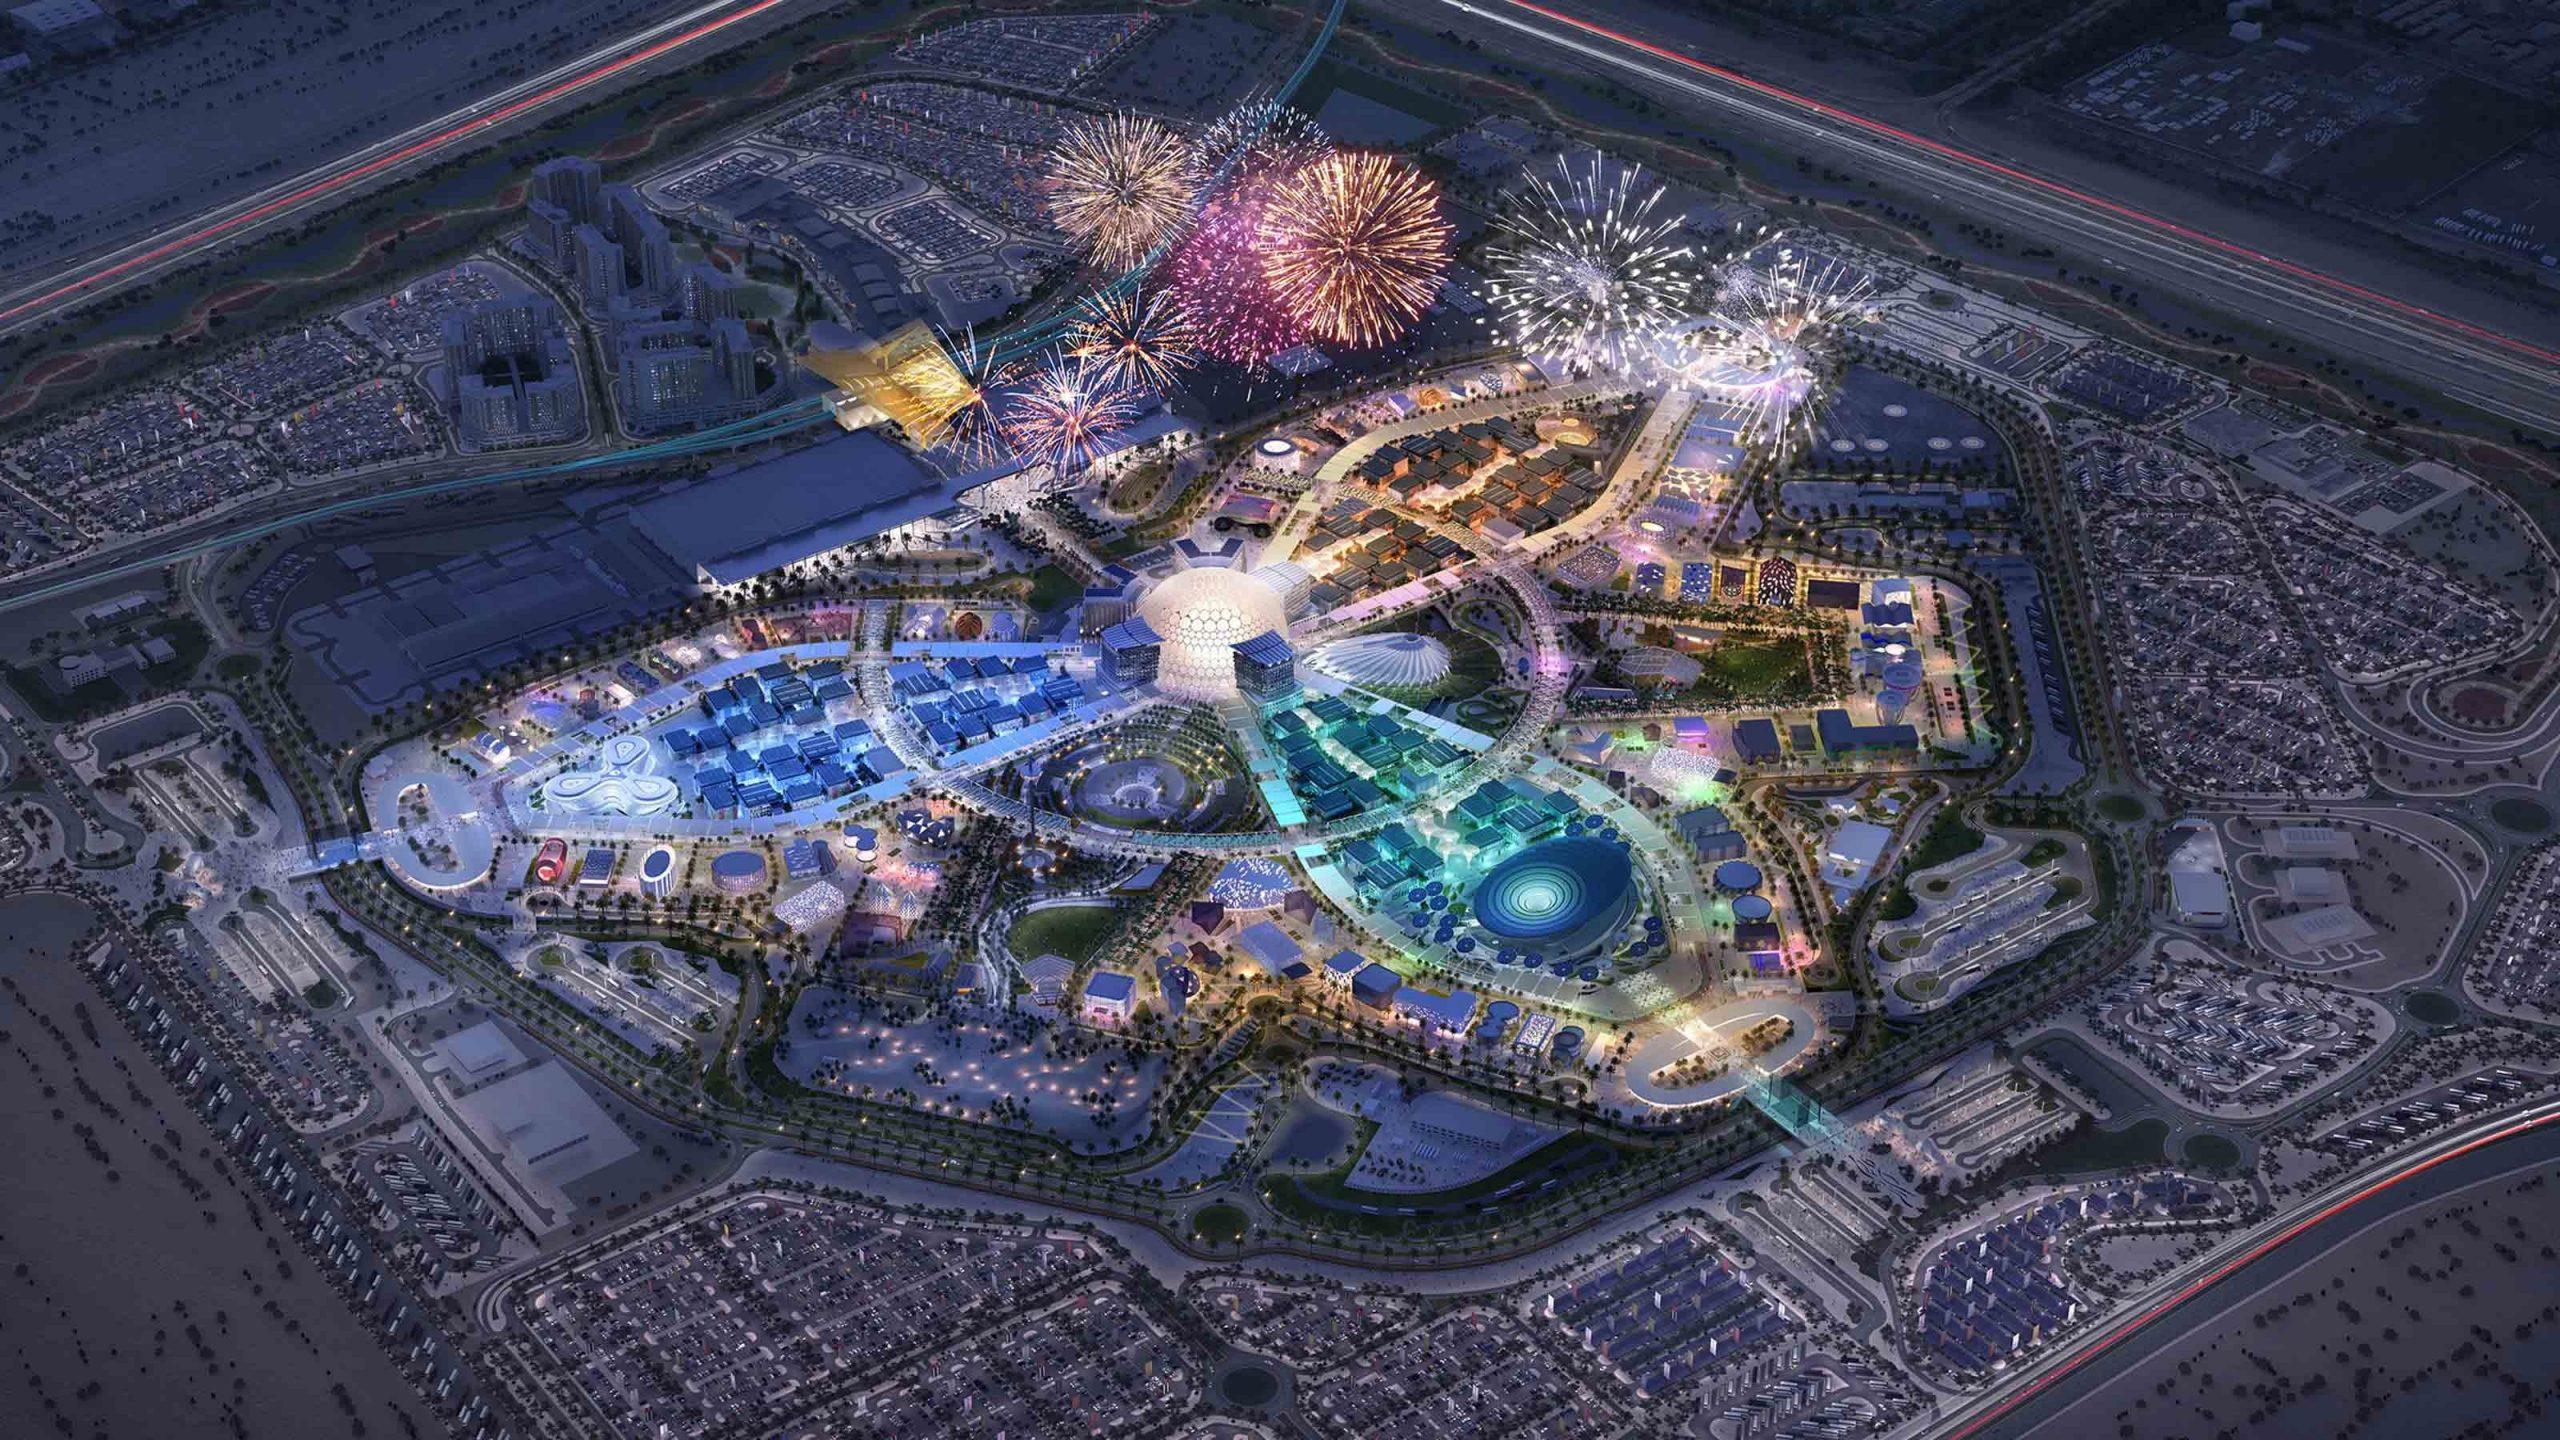 Fireworks over Expo 2020 Dubai